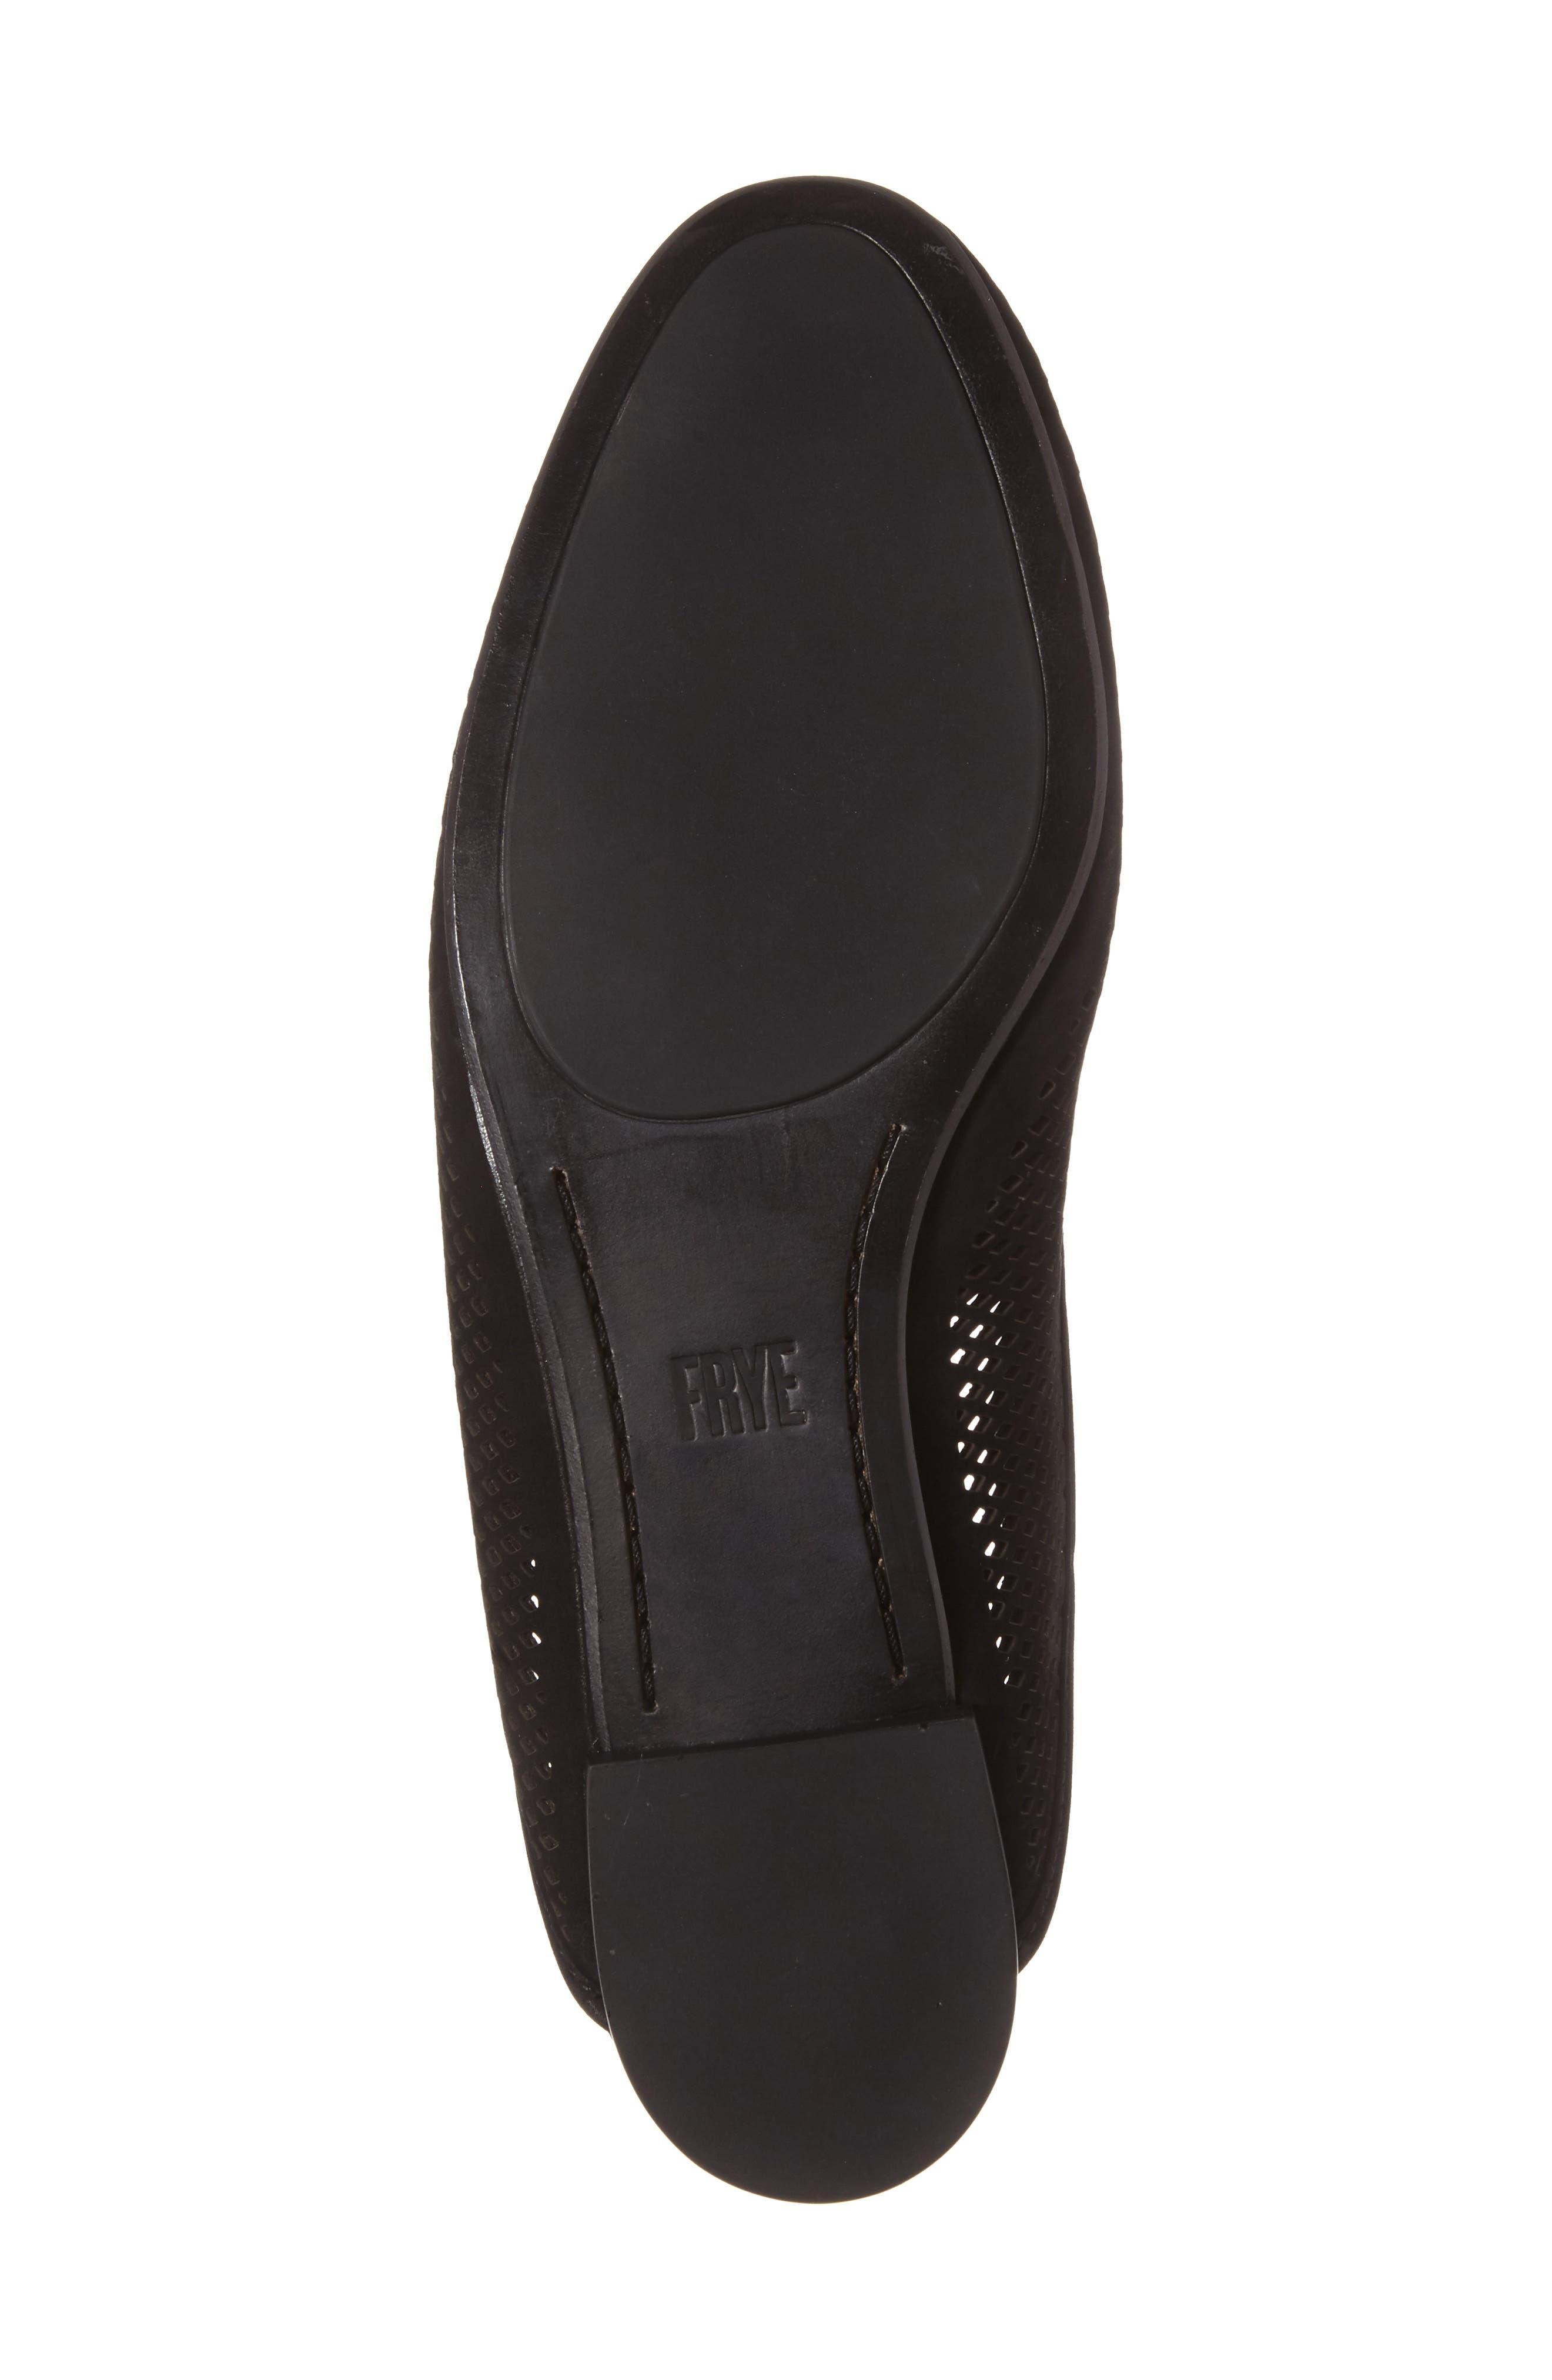 Gwen Perforated Mule,                             Alternate thumbnail 4, color,                             Black Nubuck Leather